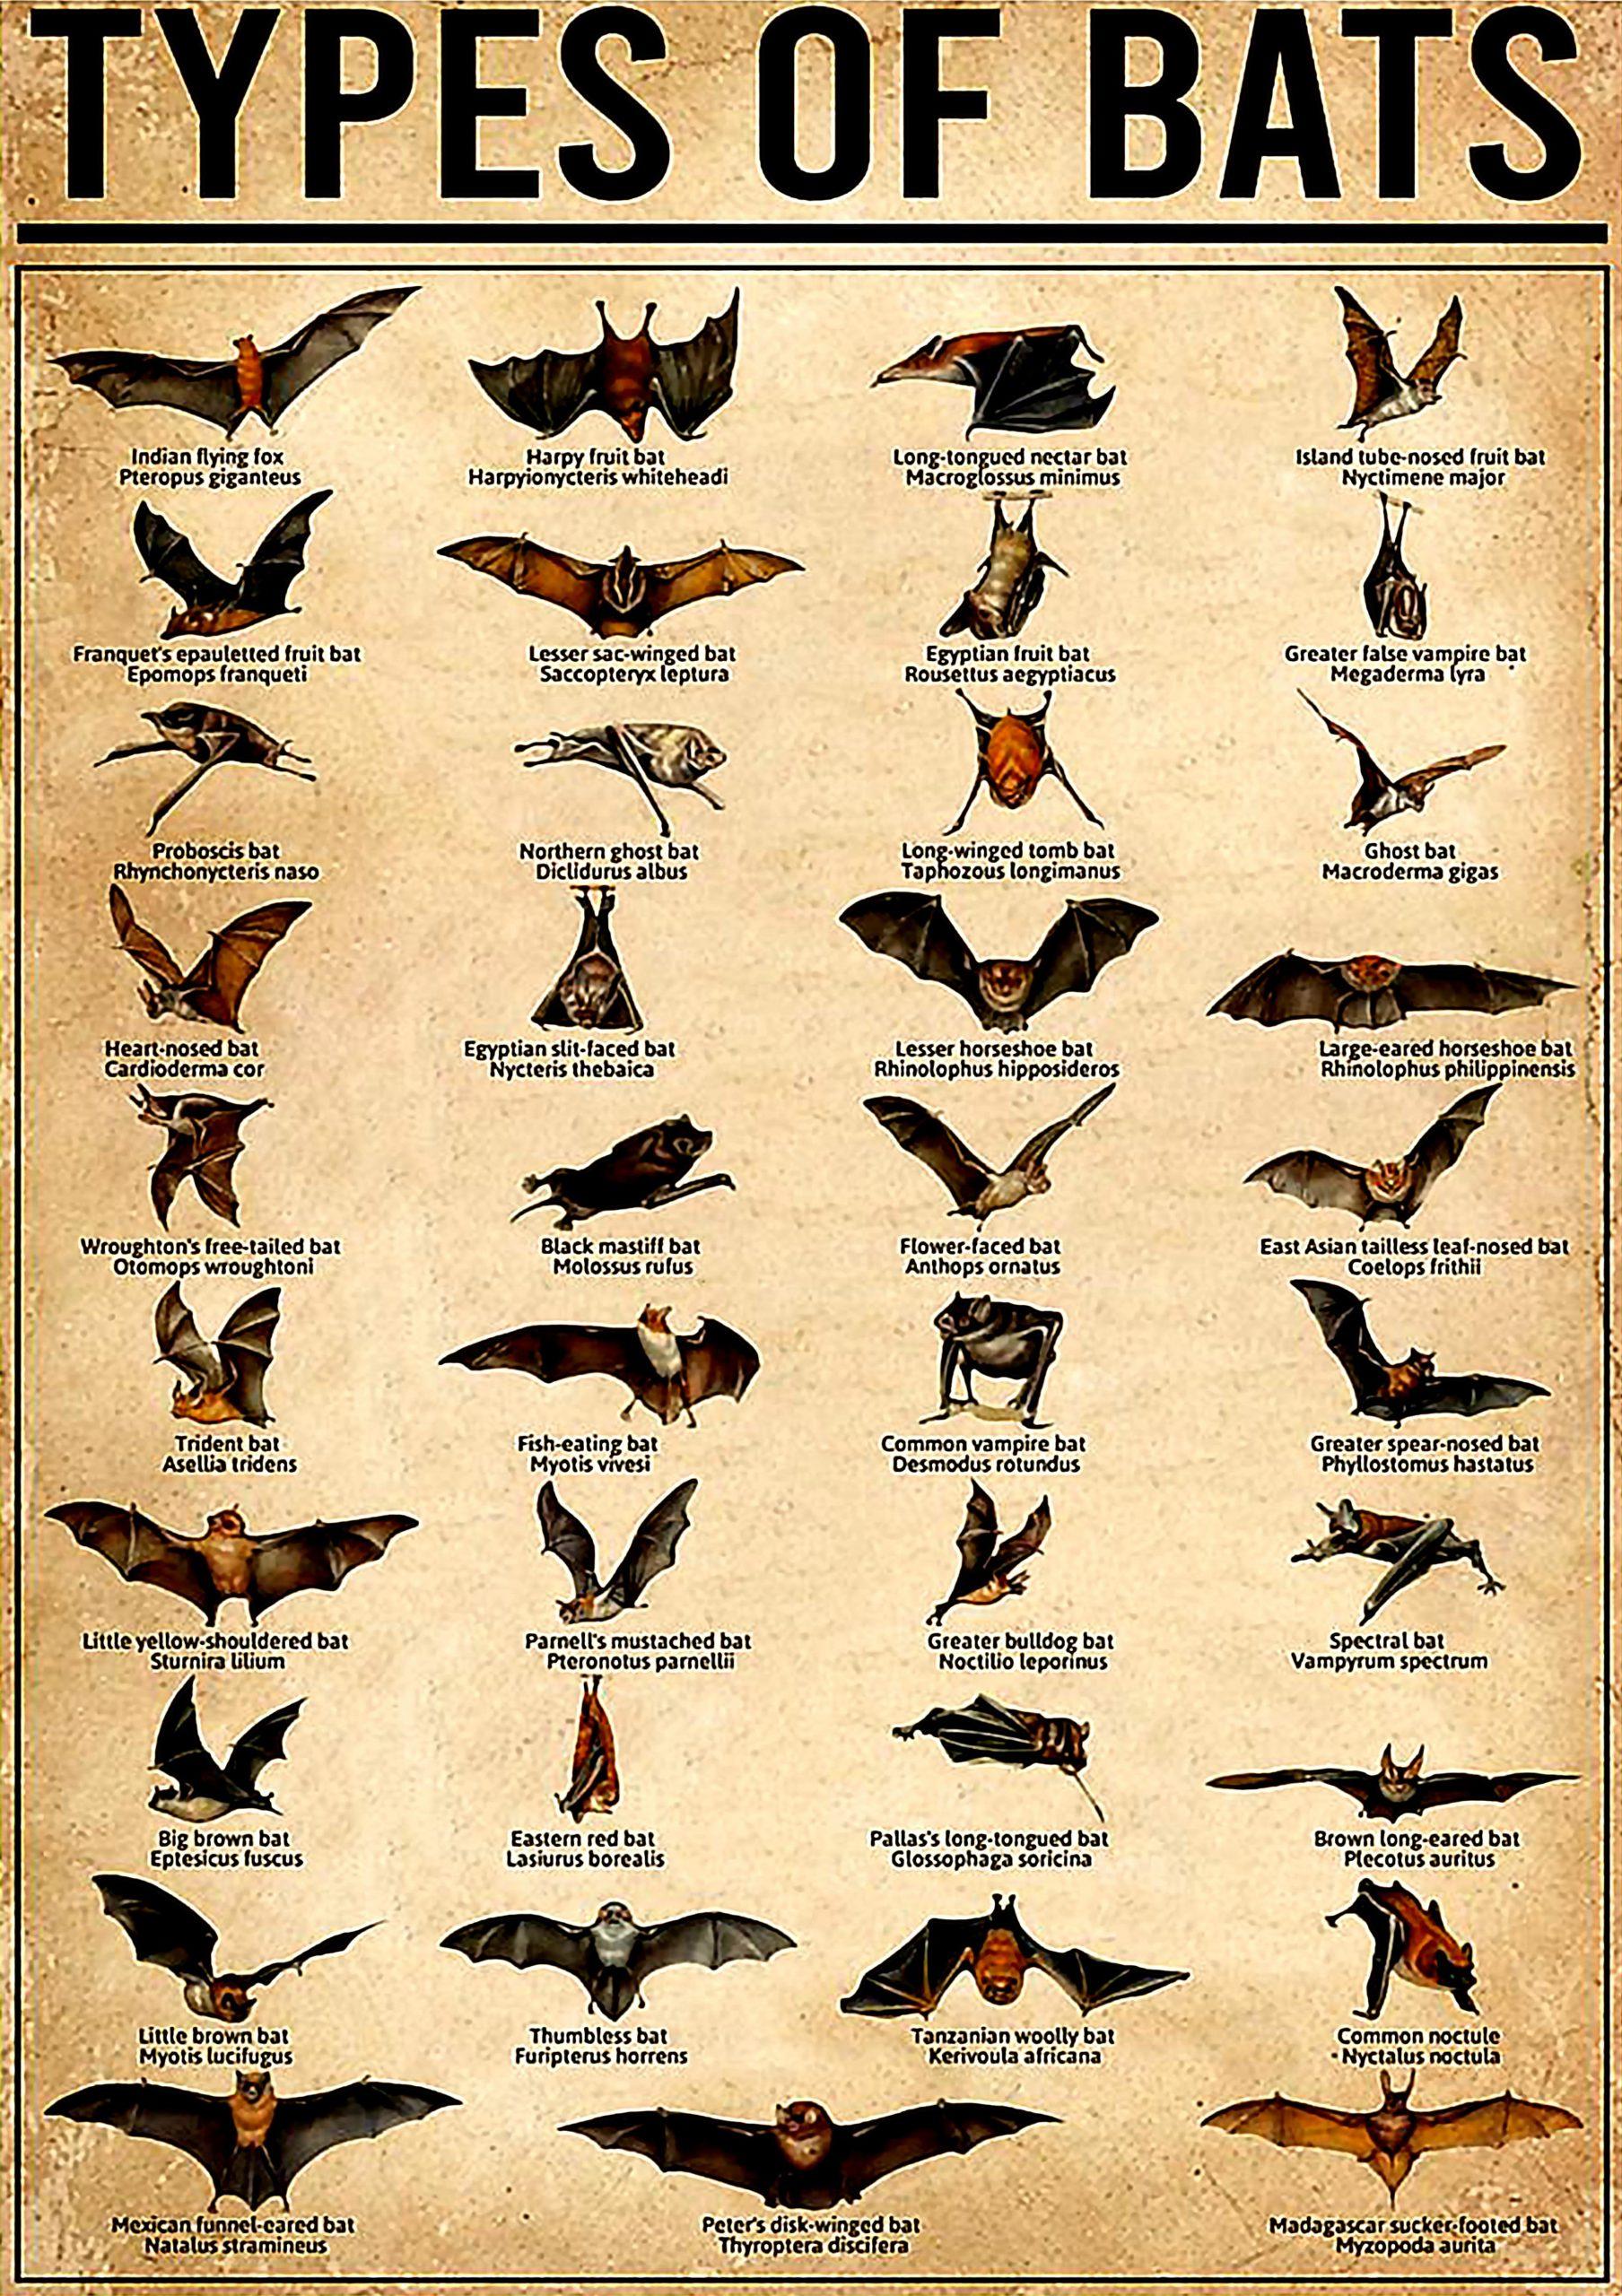 vintage types of bats poster 1 - Copy (3)